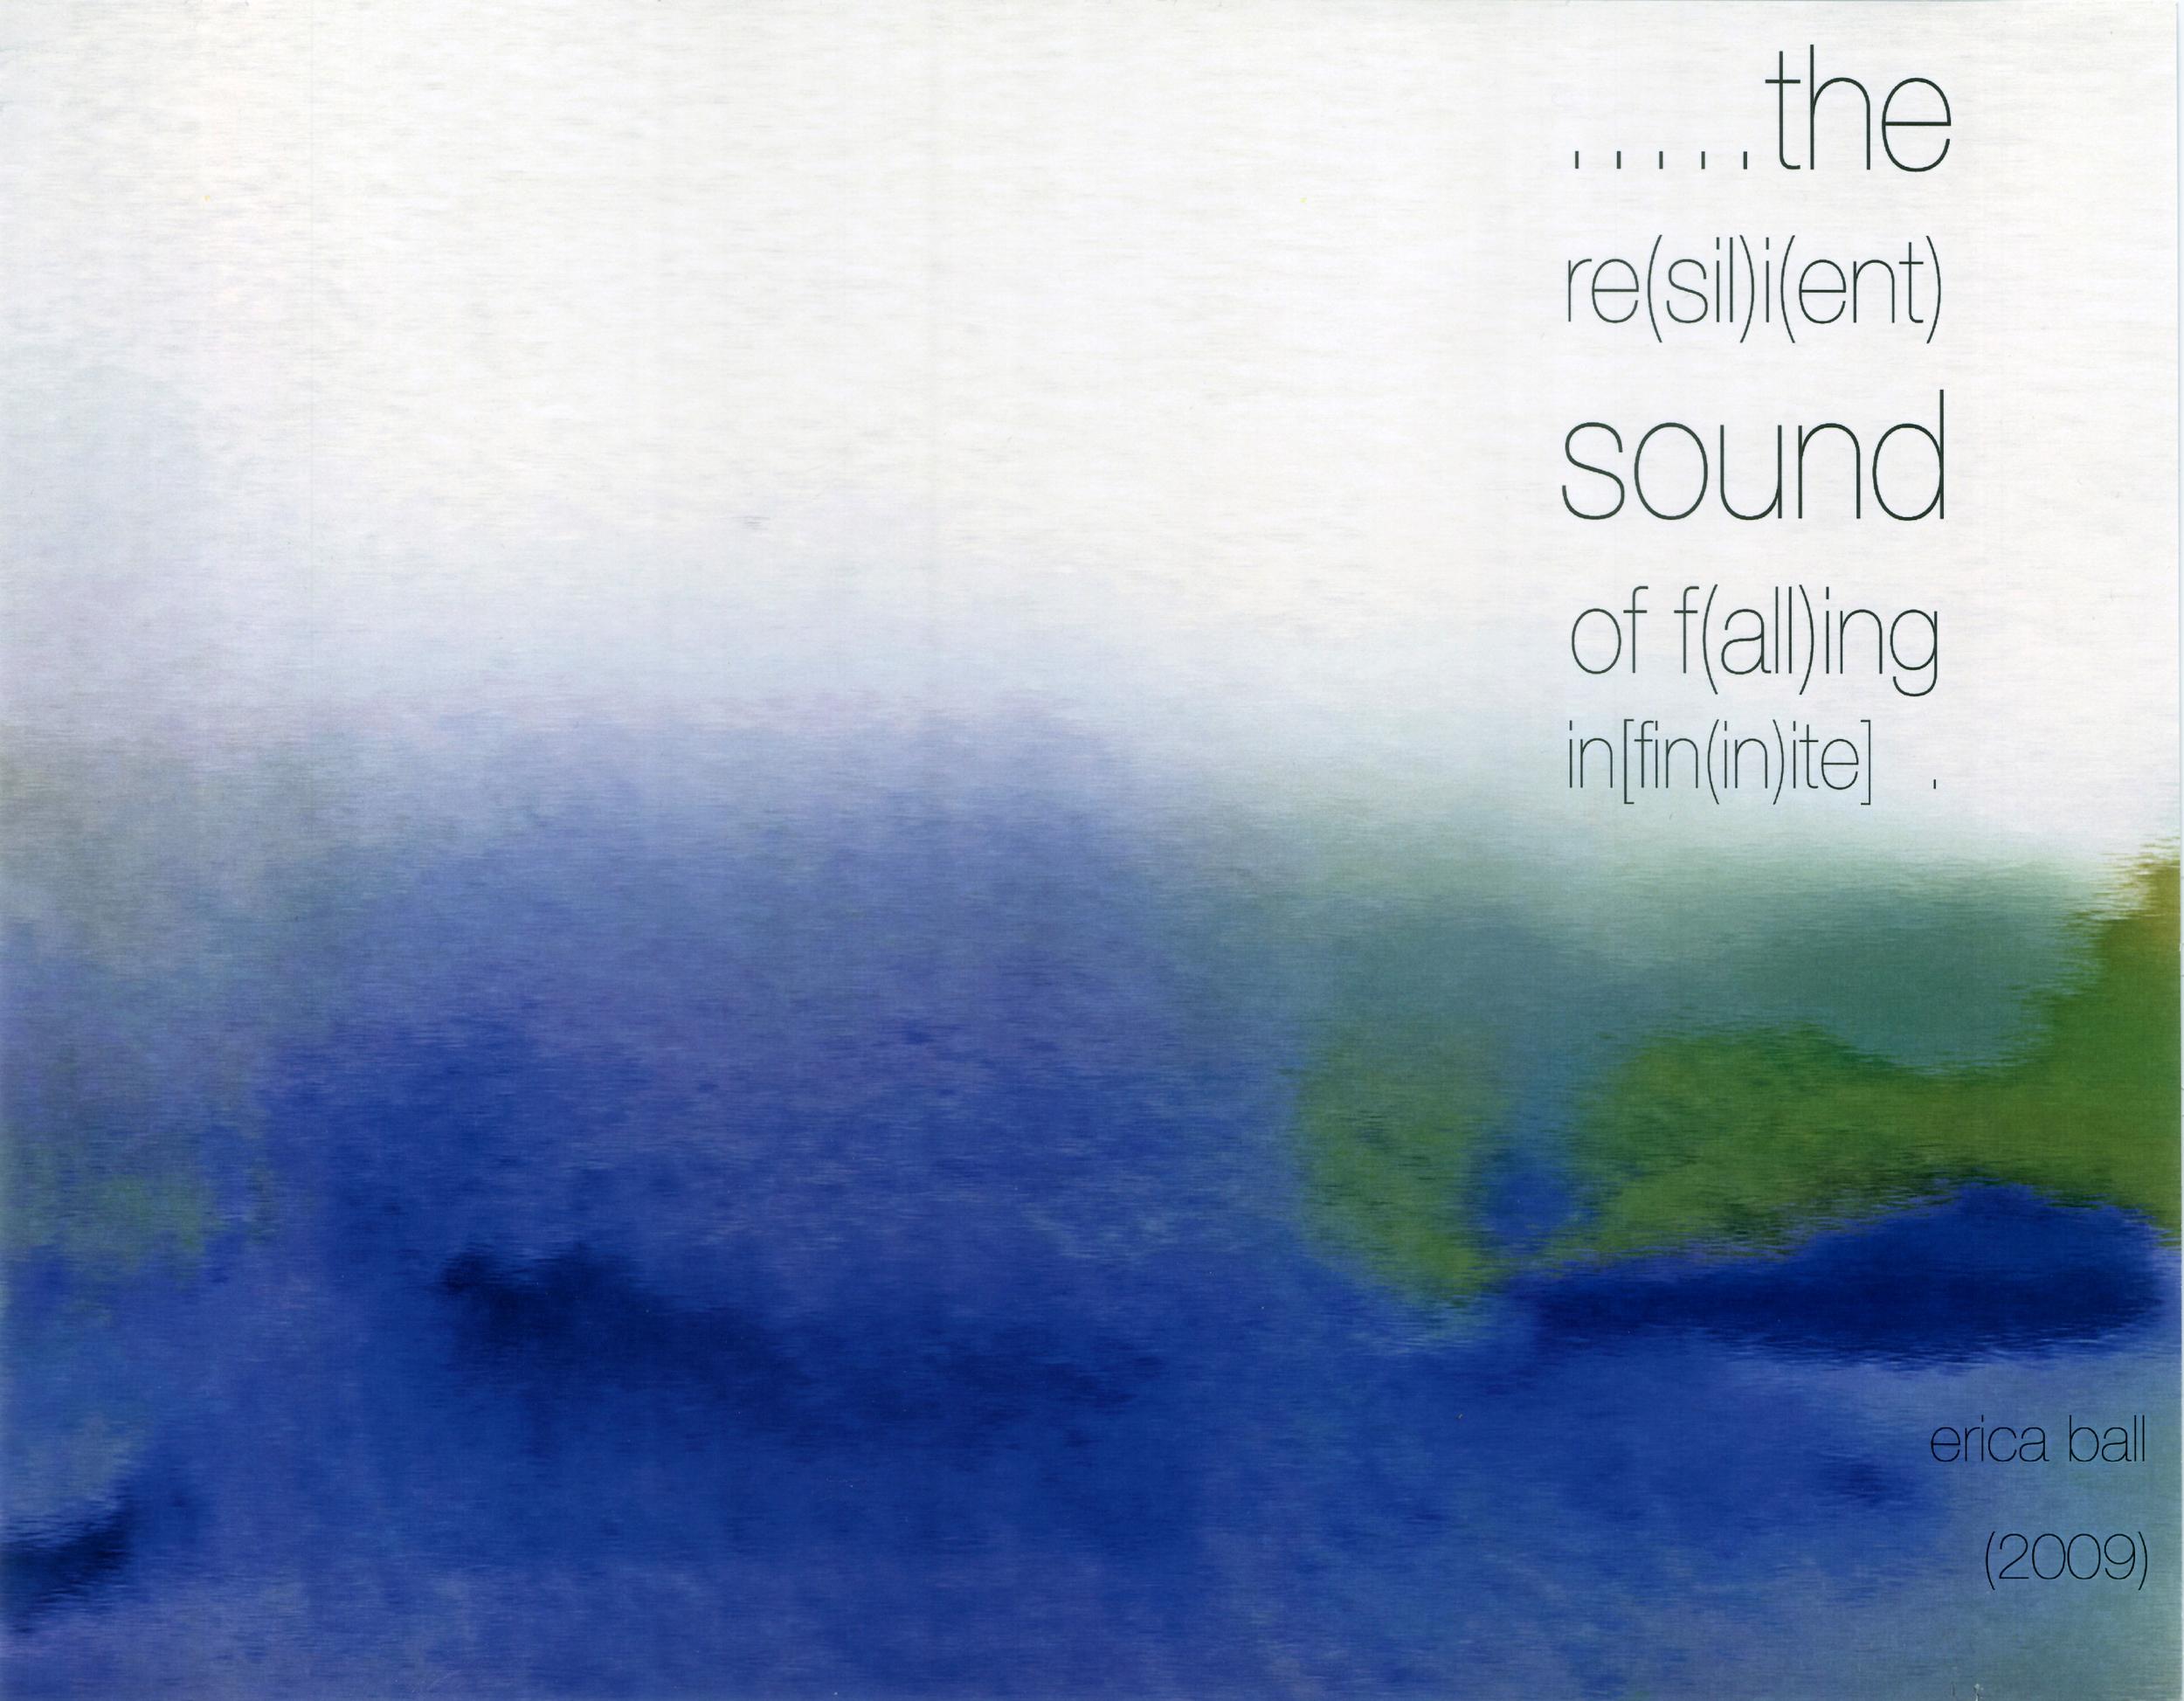 .....the re(sil)i(ent) sound  - for string quartet